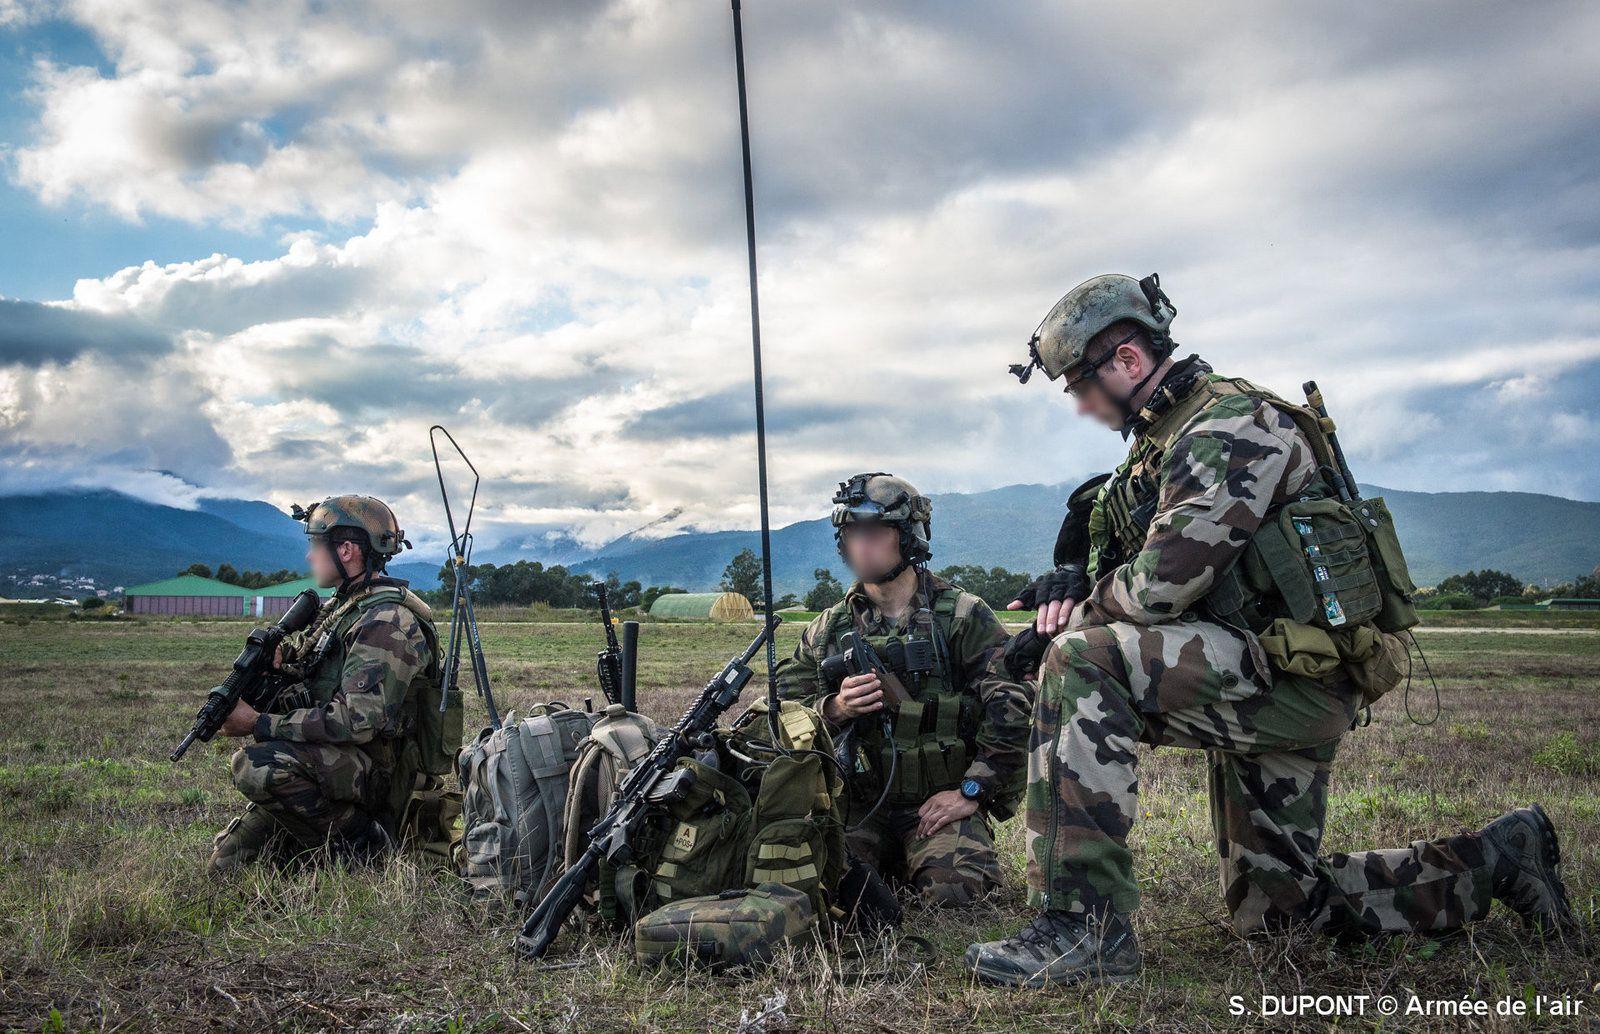 Groupe de commandos du CPA 10 en formation durant le stage BELOUGA